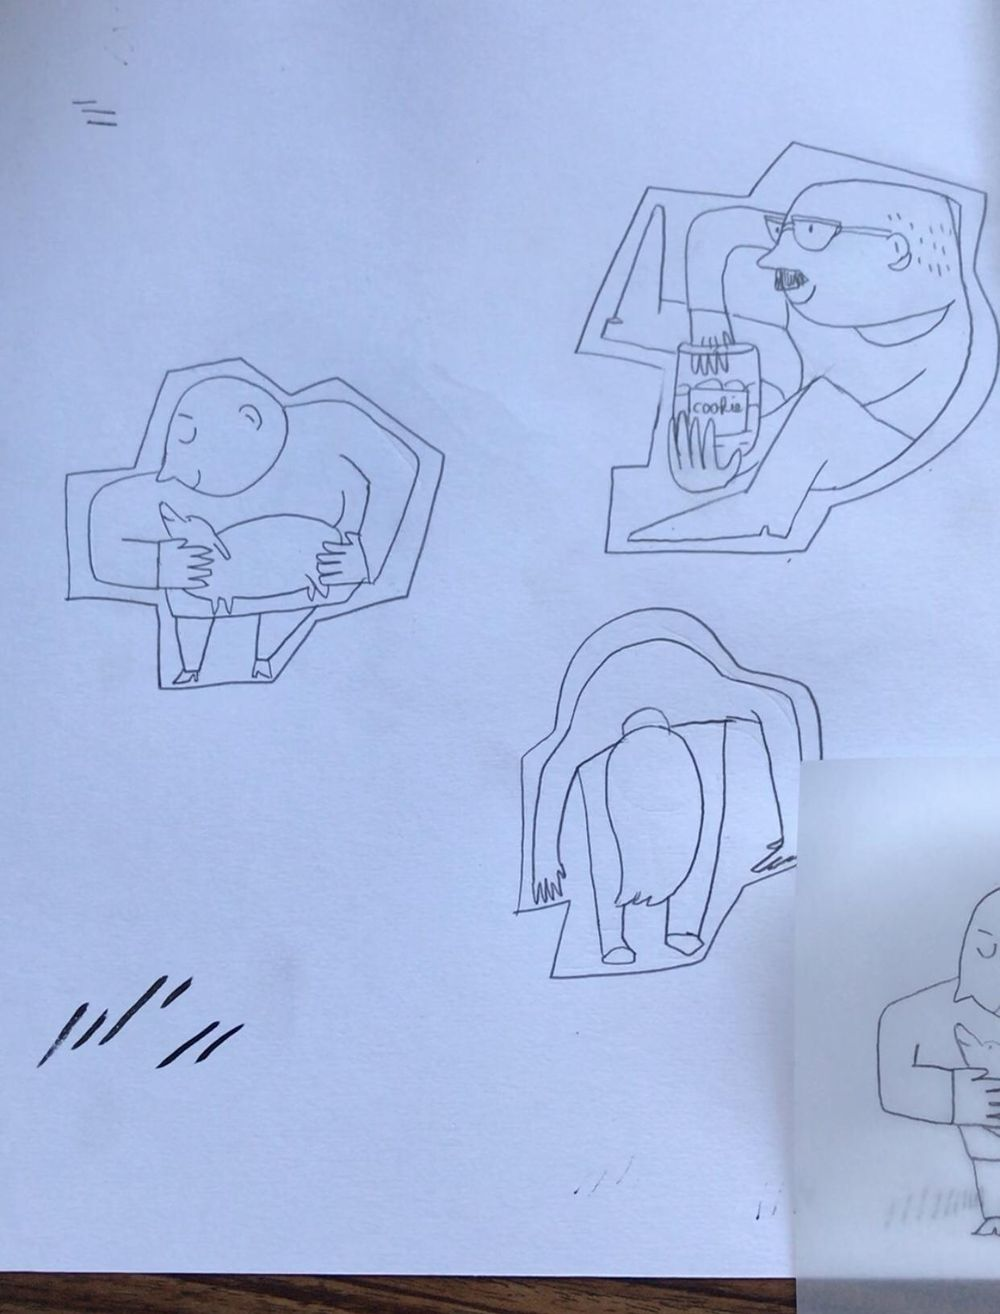 Odd bodies Mieke van der Merwe - image 1 - student project